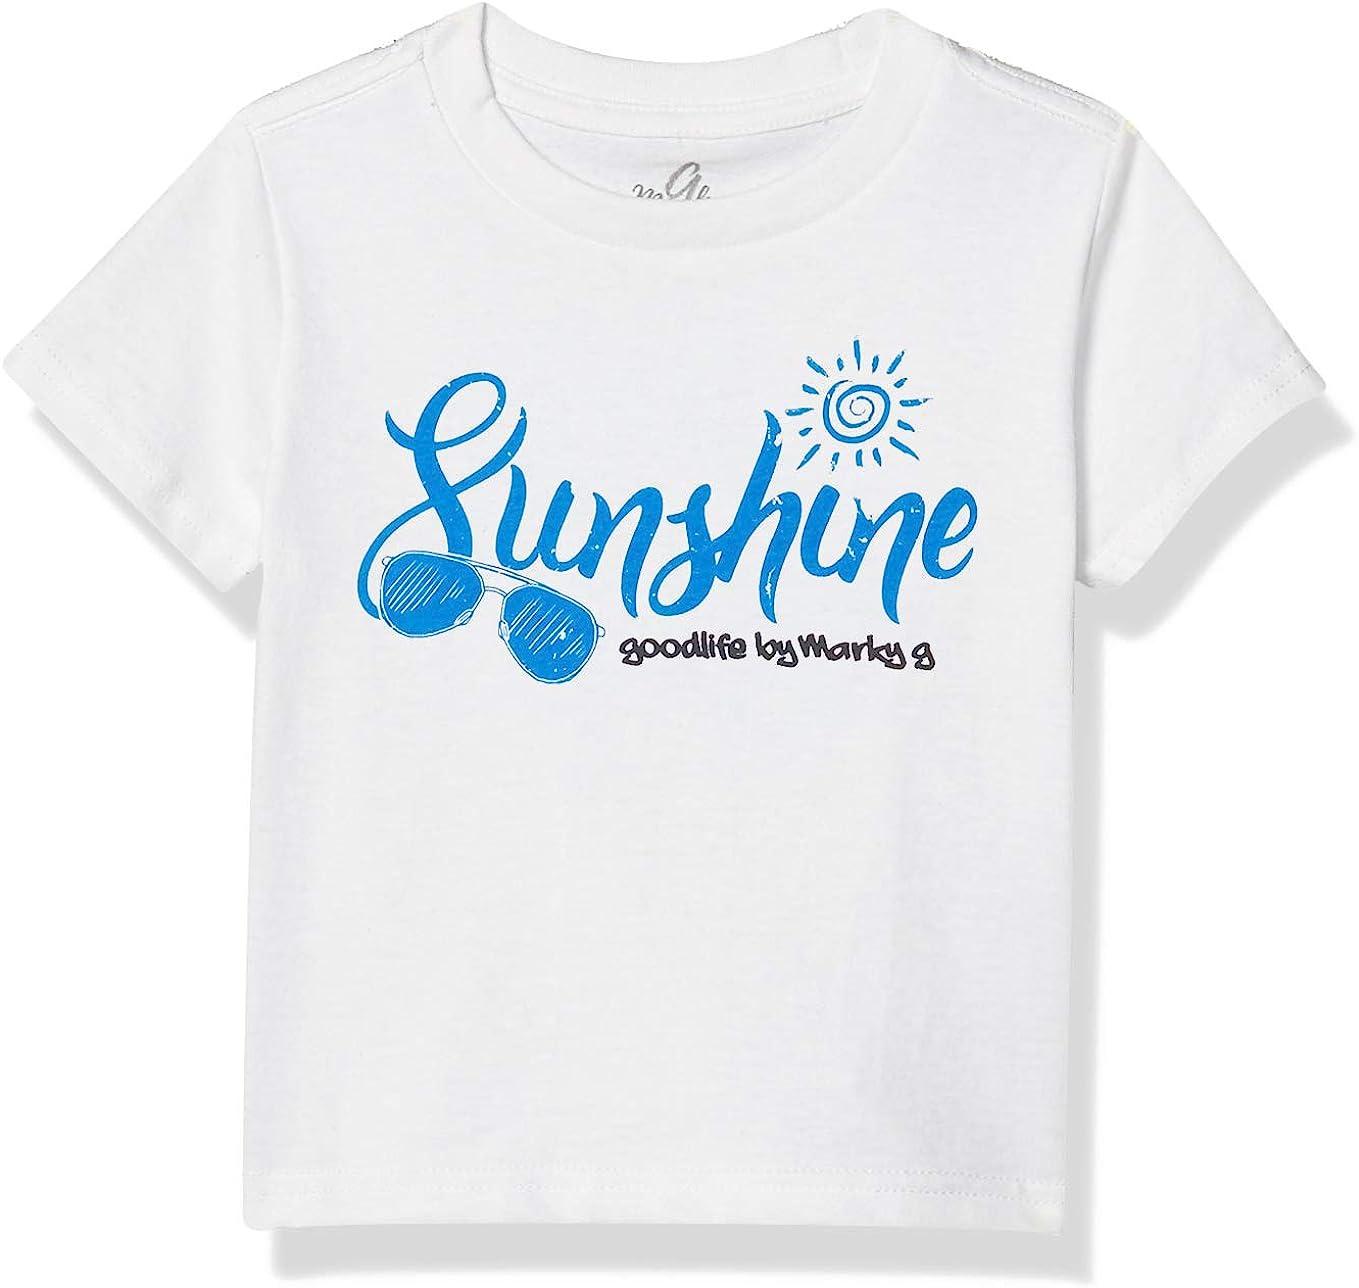 Marky G Apparel Boys' Printed Sunshine Graphic Cotton Jersey T-Shirt